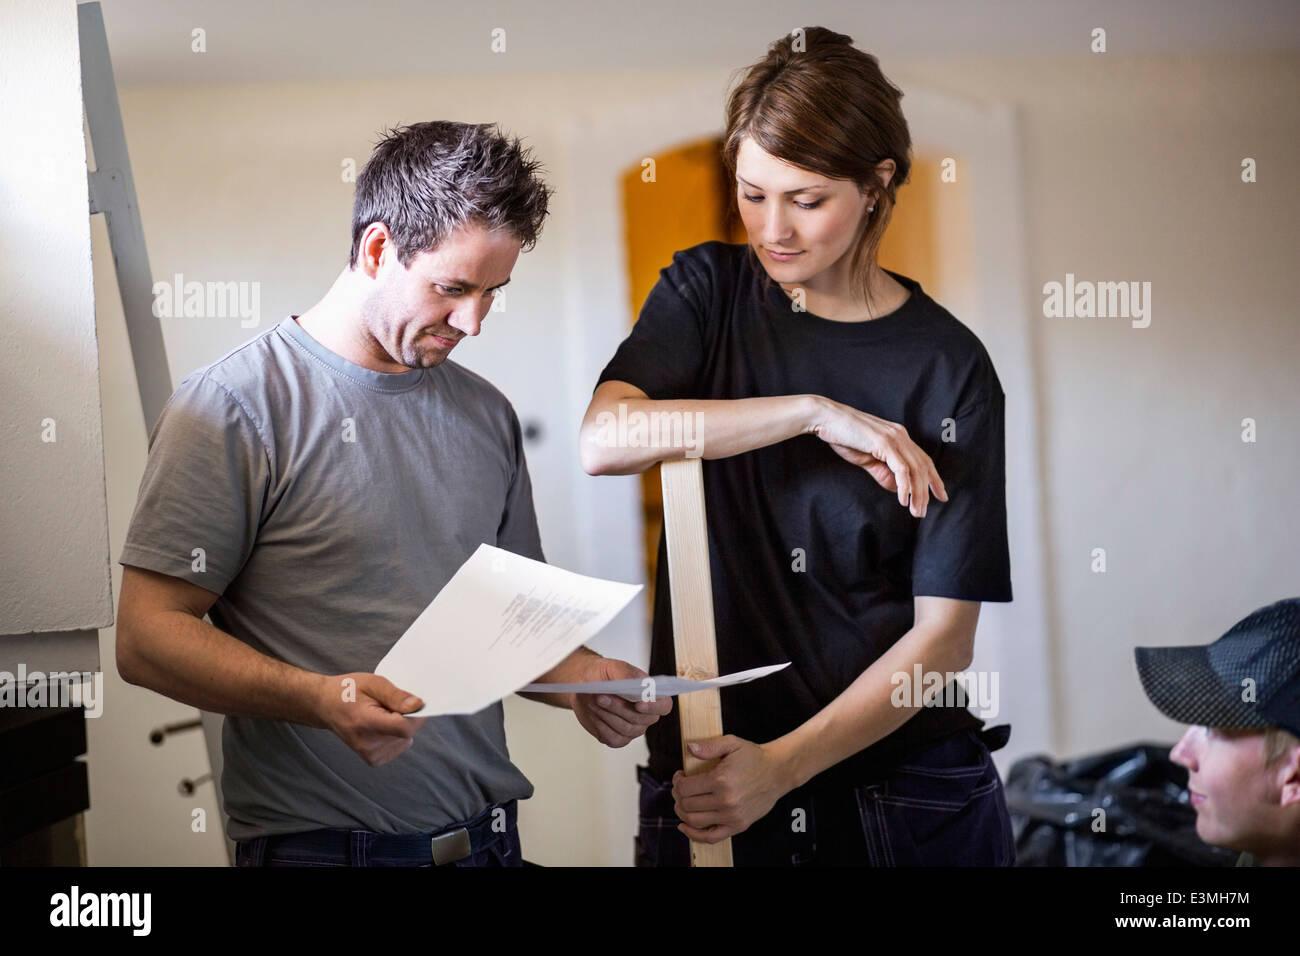 Carpenters examining documents at site - Stock Image